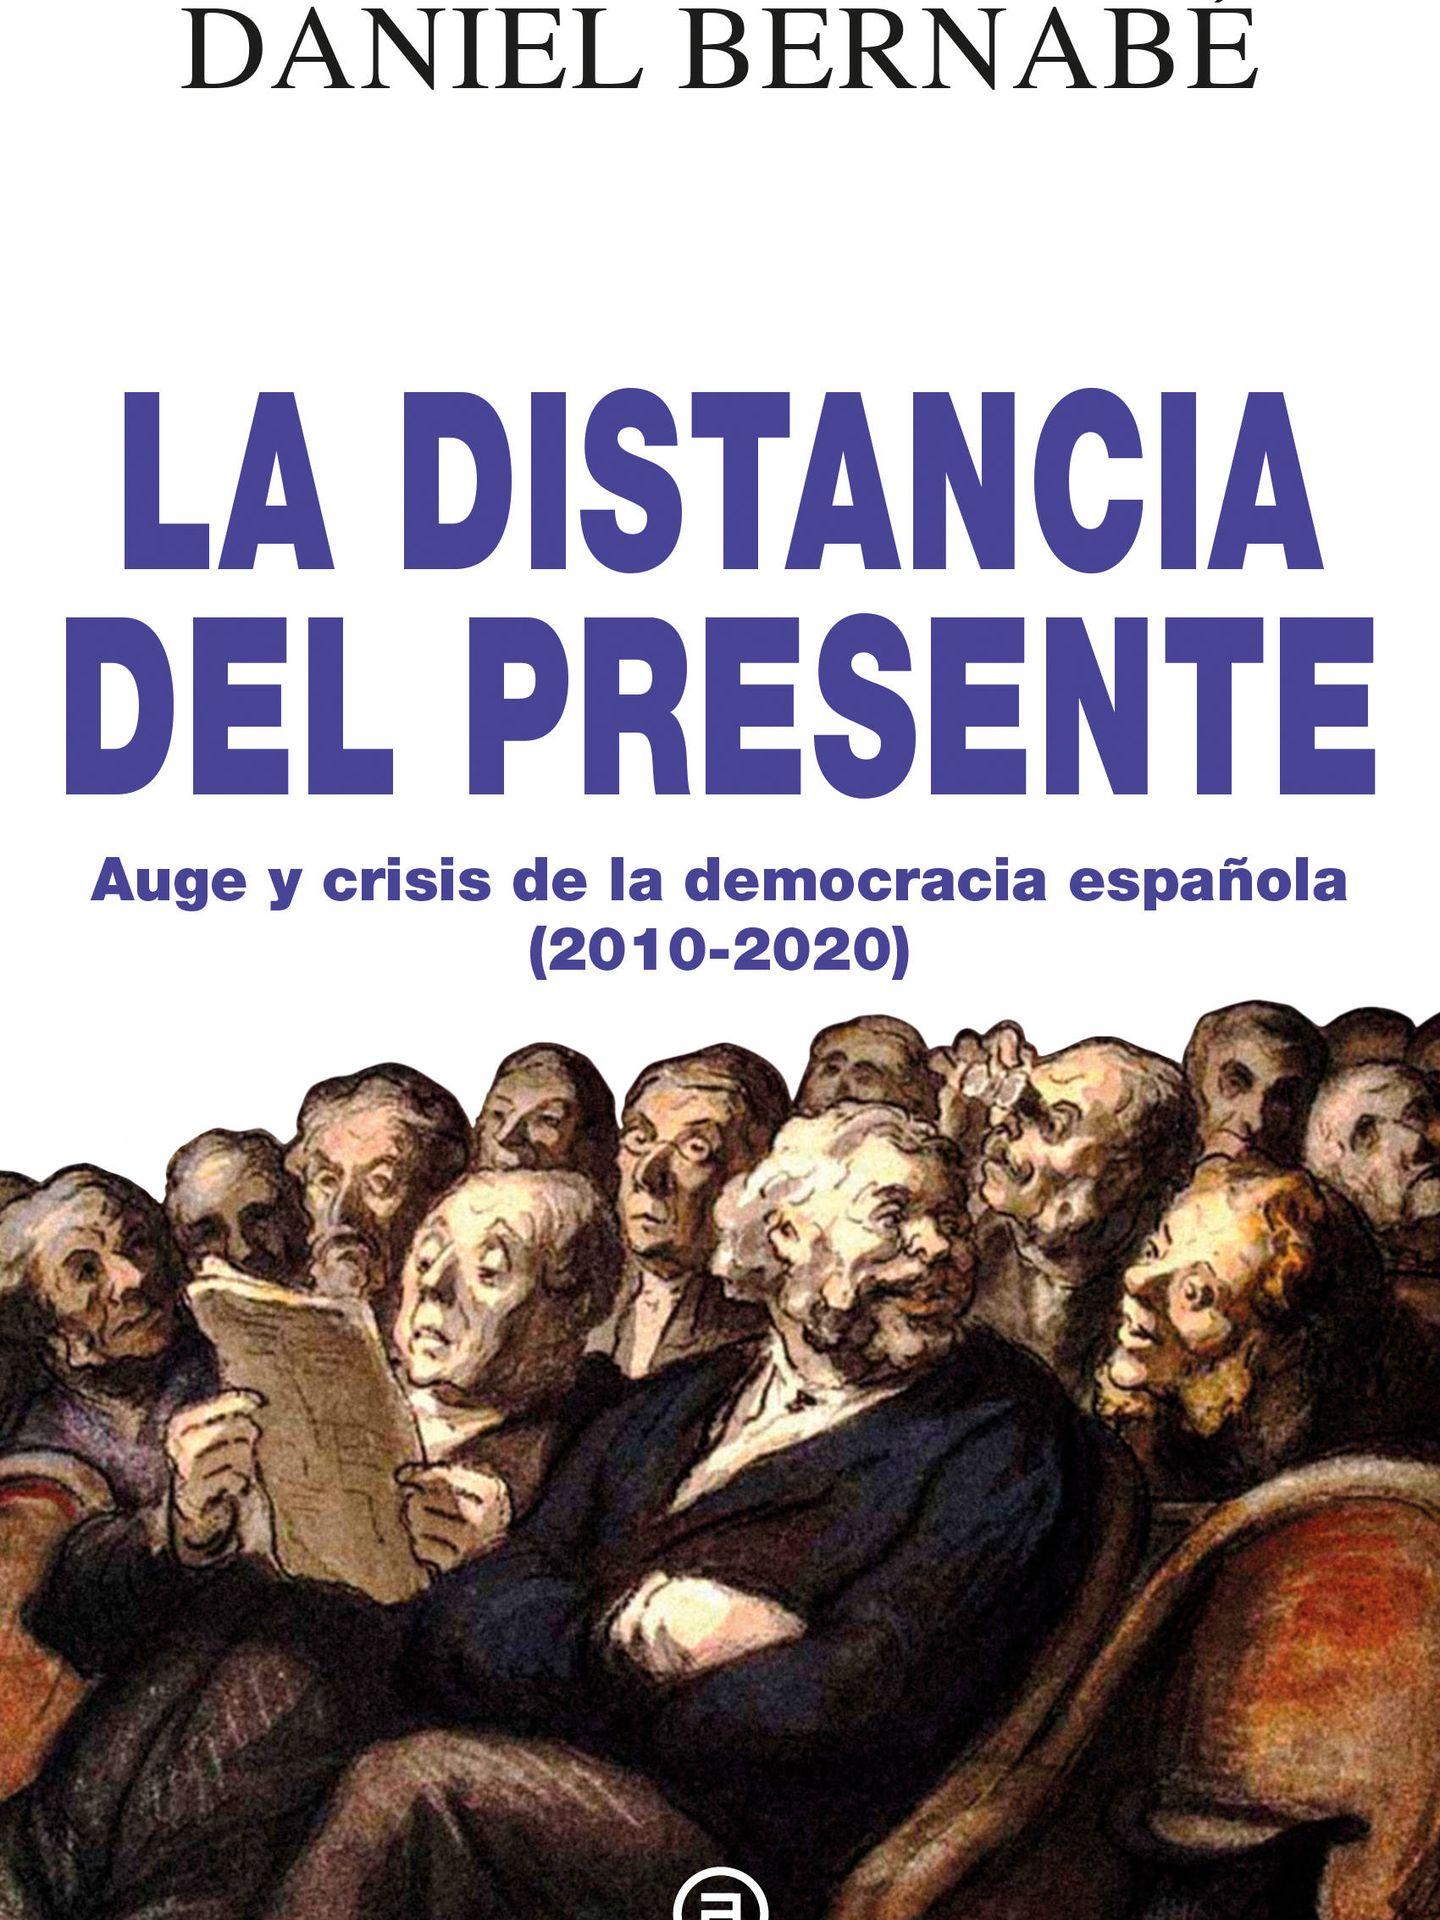 'La distancia del presente'.